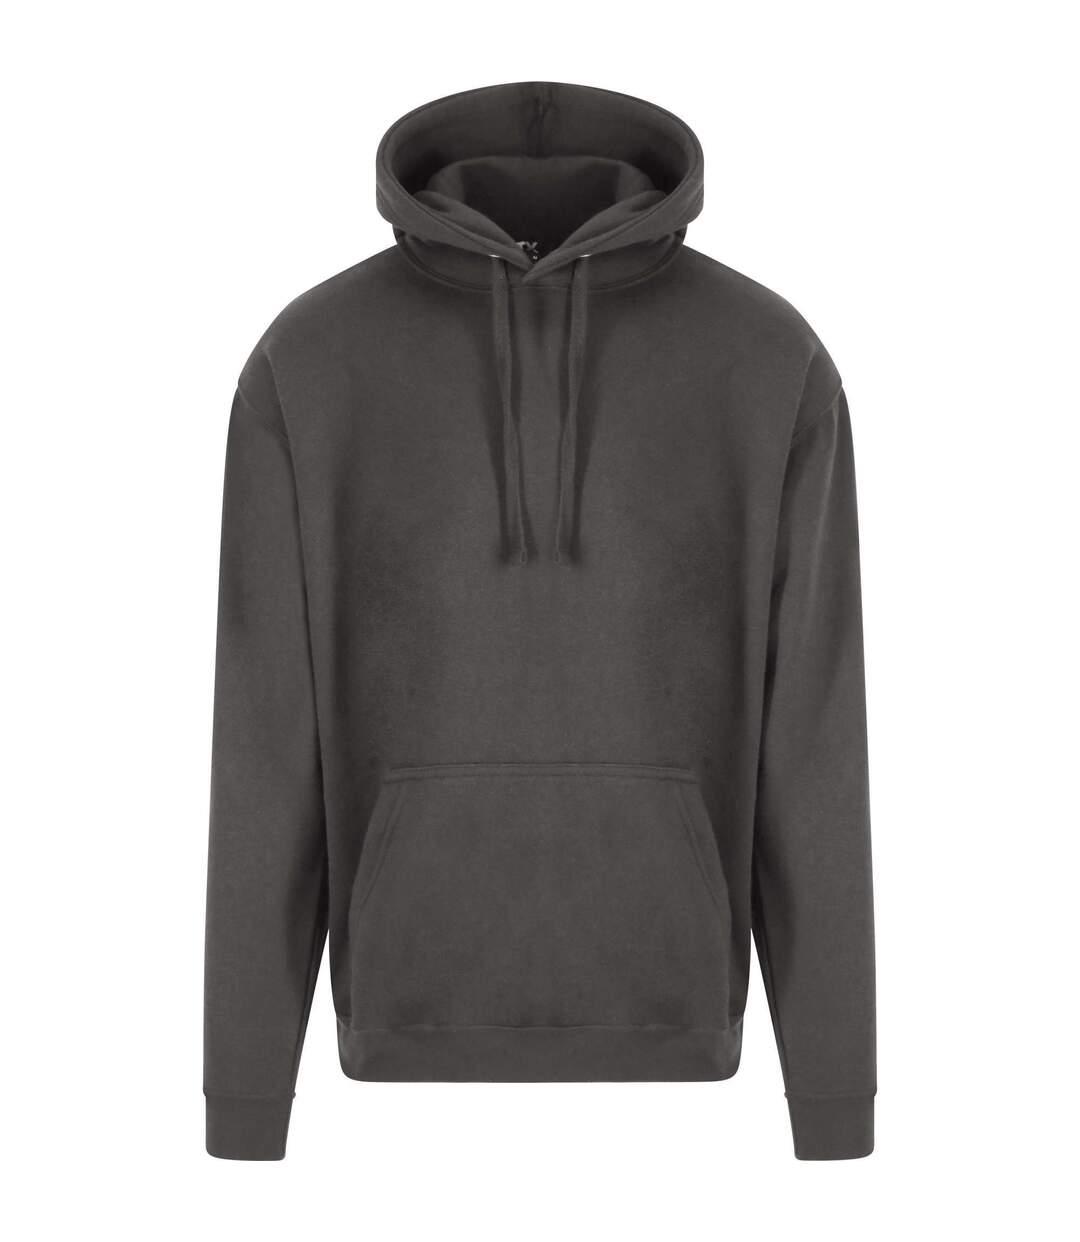 PRO RTX Mens Pro Hoodie (Charcoal) - UTPC3538